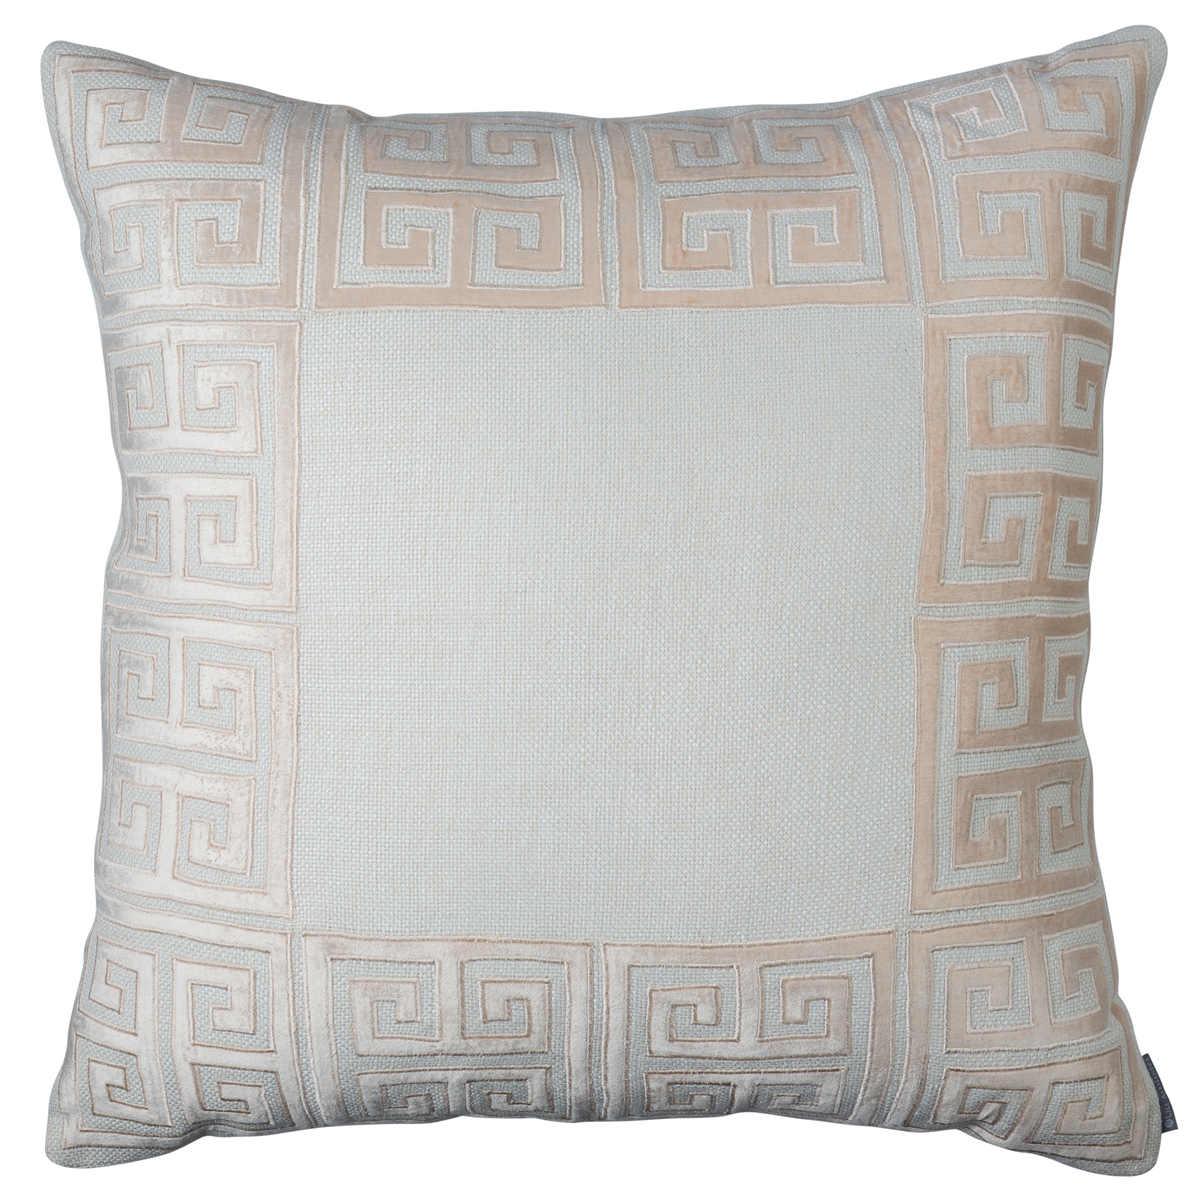 European Down Pillow Inserts